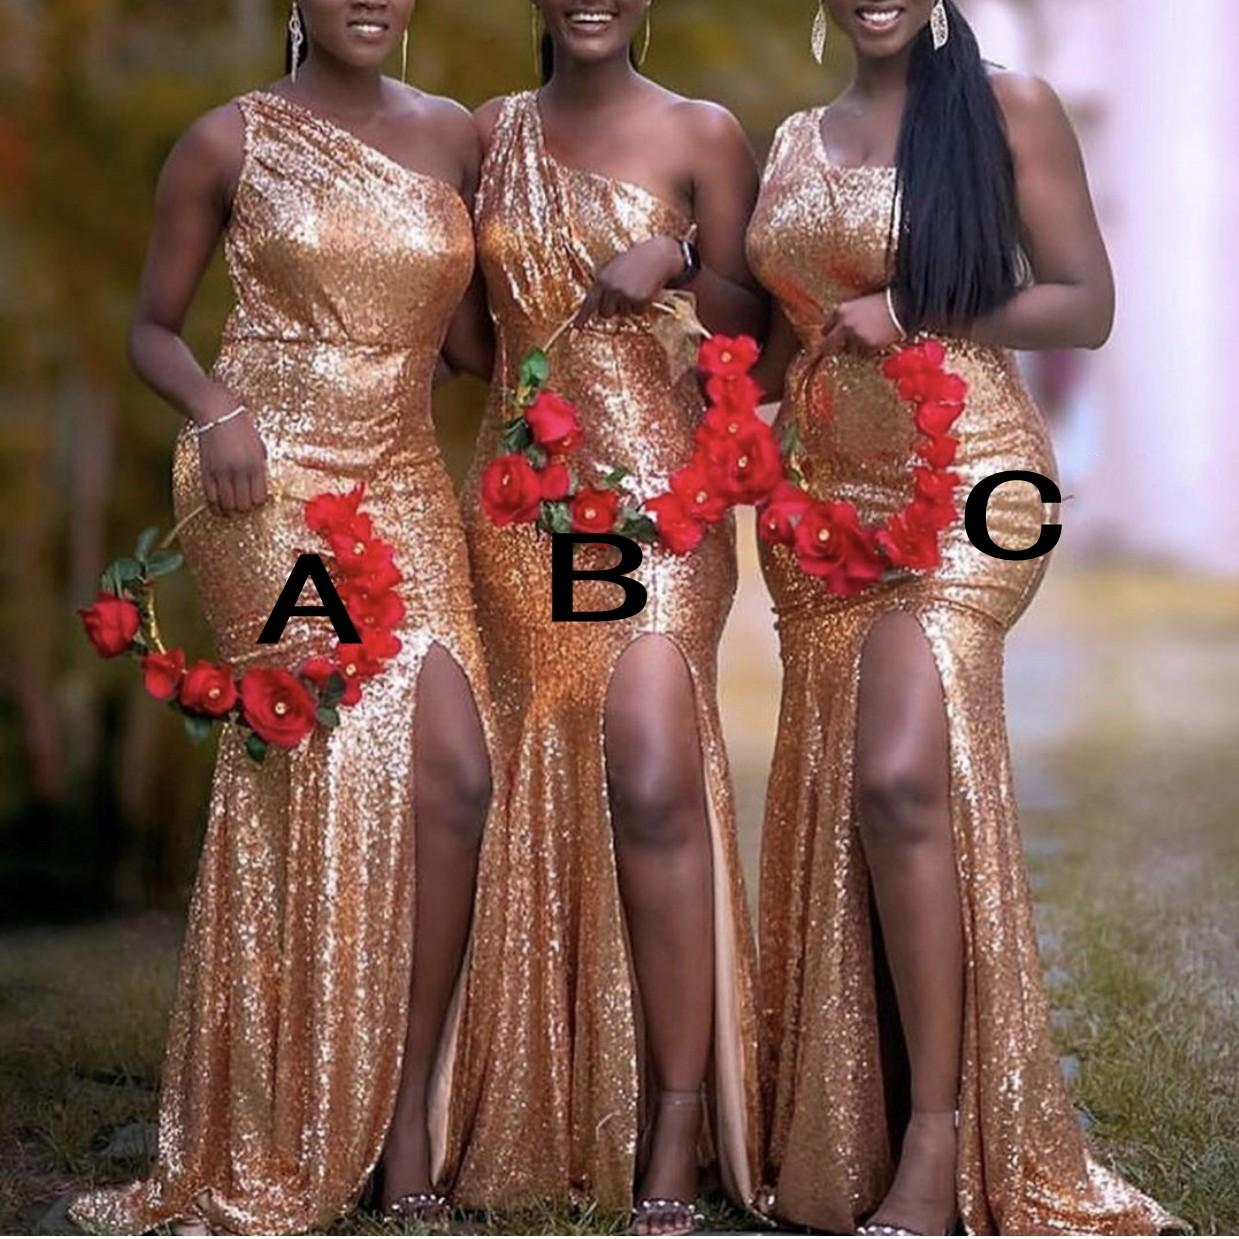 Rose Gold Sequins Vestidos dama Mixed festa de casamento Custom Made Order Visitante vestido diferente decote Júnior dama de honra Vestido barato